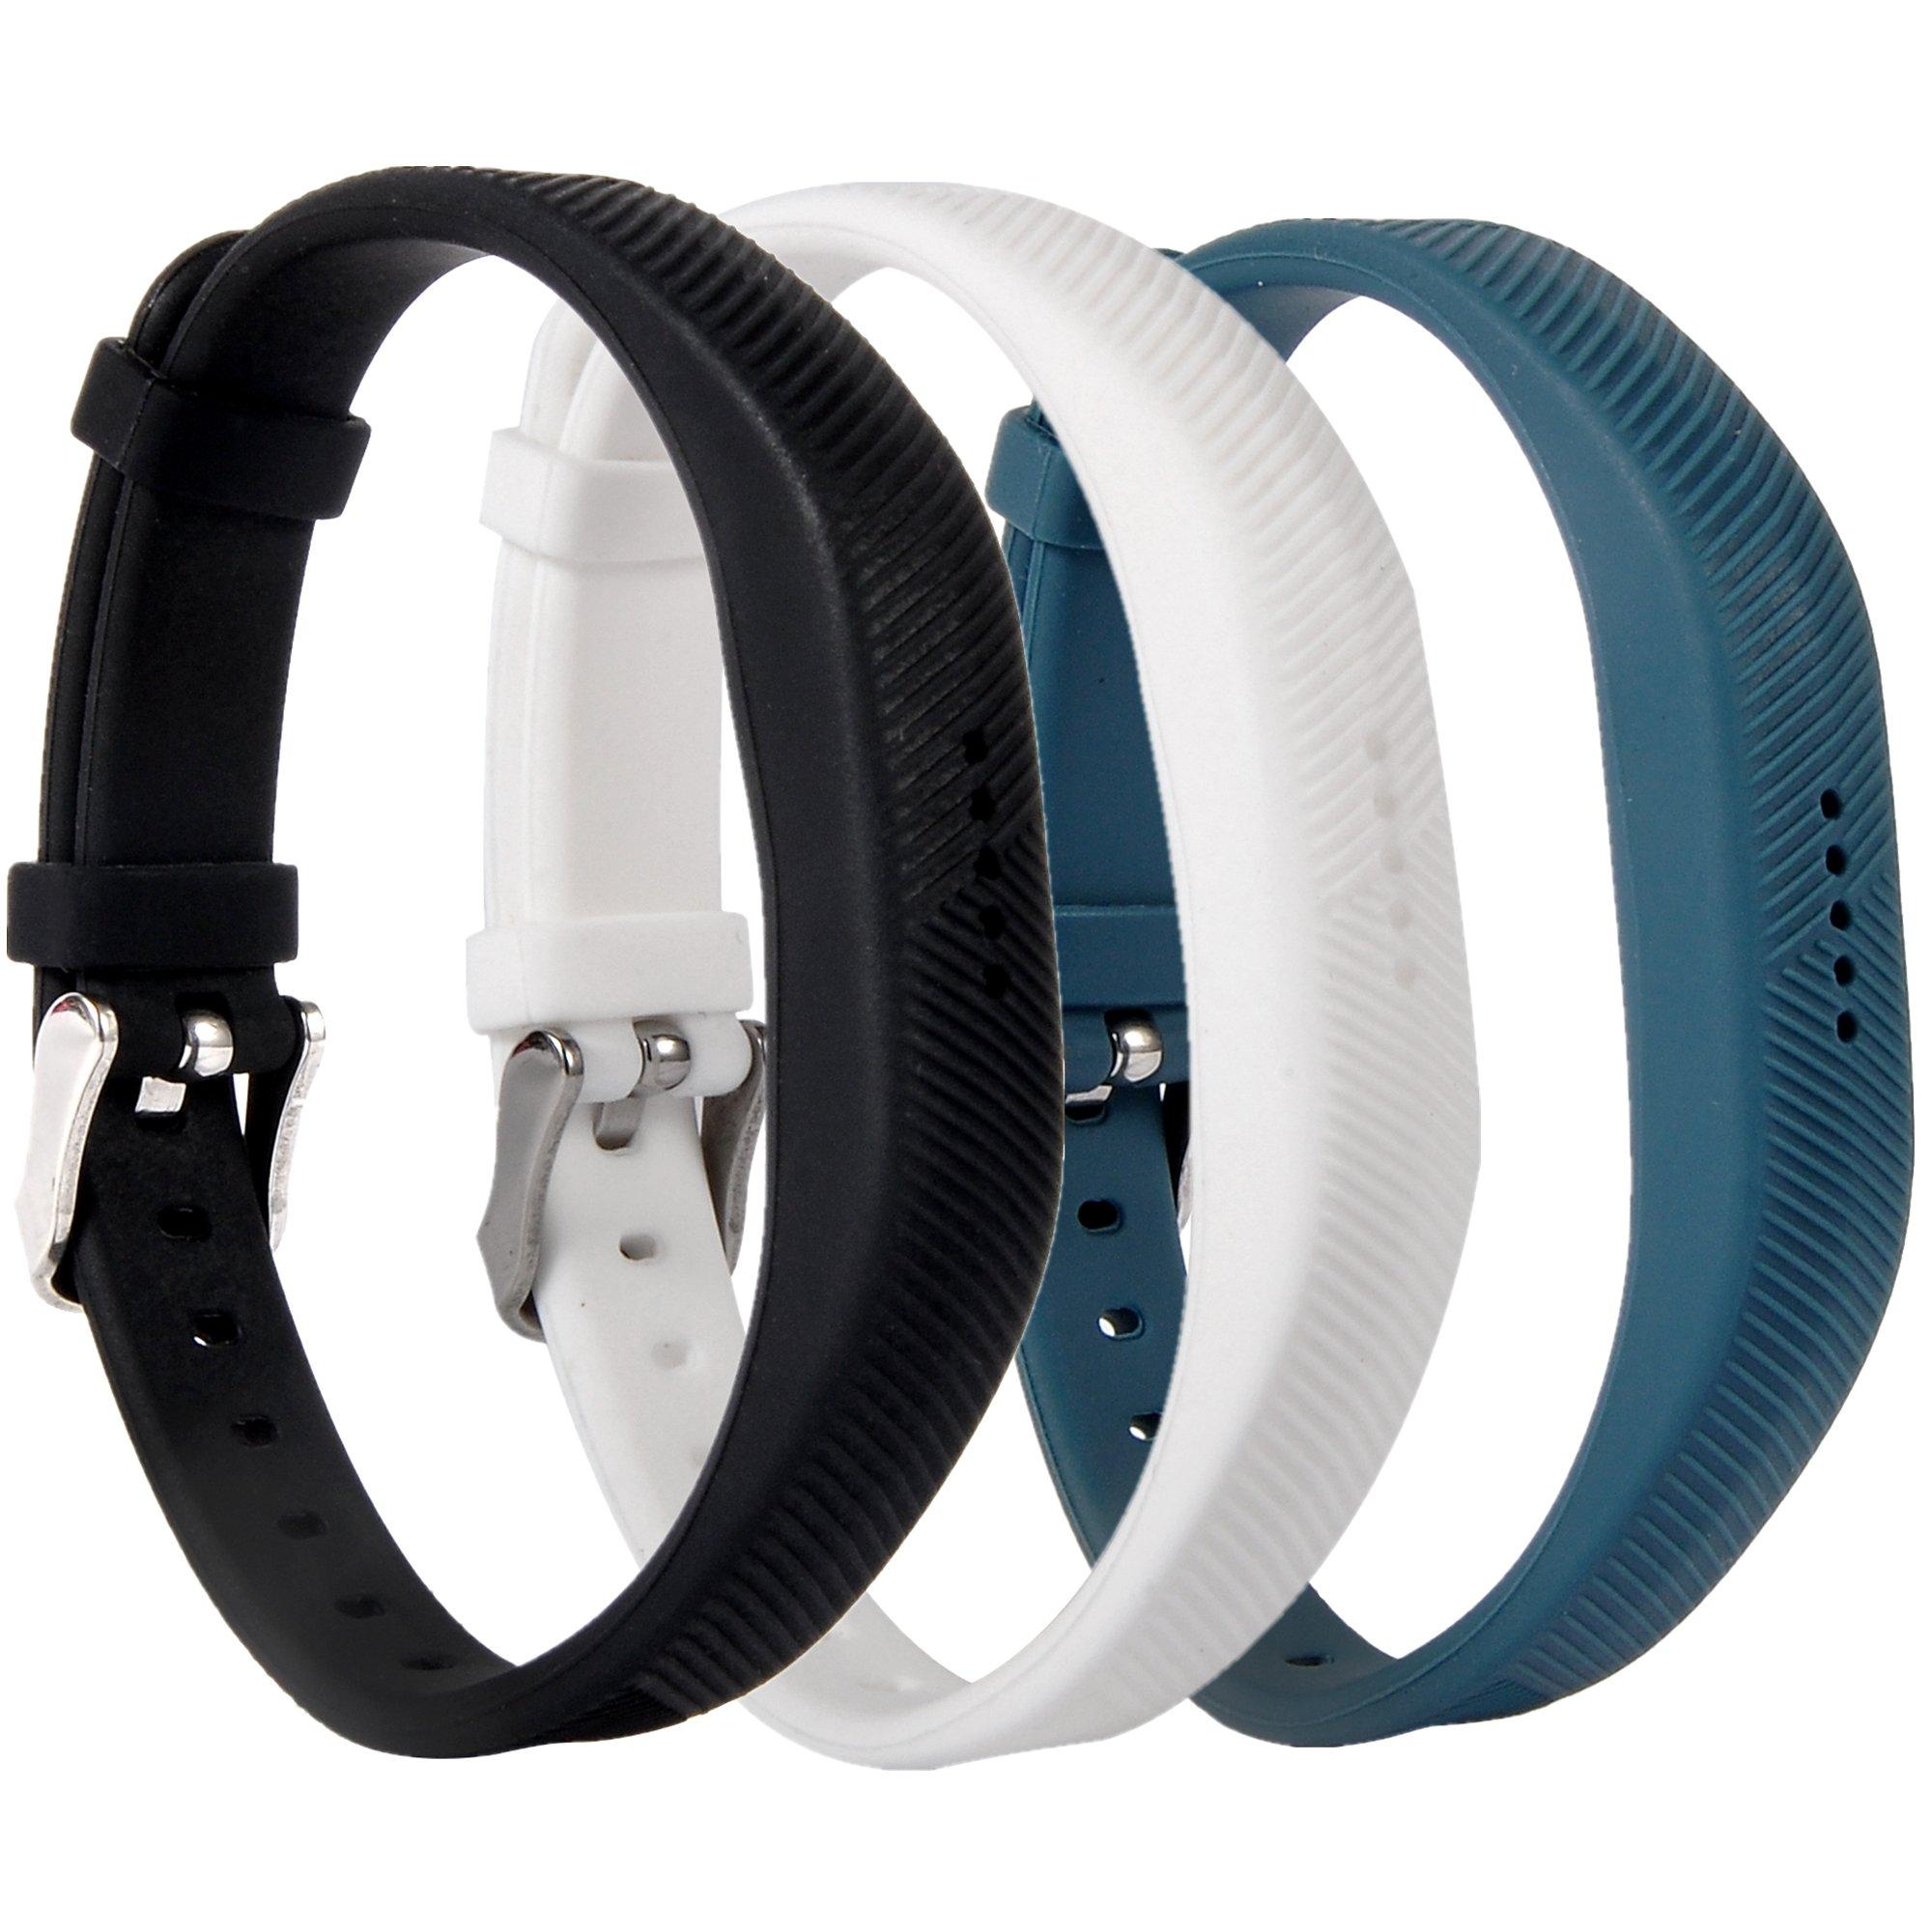 Huishang Flex 2 Accessory Bands for Fitbit Flex 2 / Fit bit flex2, With Chrome Claspor Soft Silicone Fitness Bracelet Strap, Adjustable Repalcement Wrist Band for Fitbit Flex 2 Fitness Smart Watch